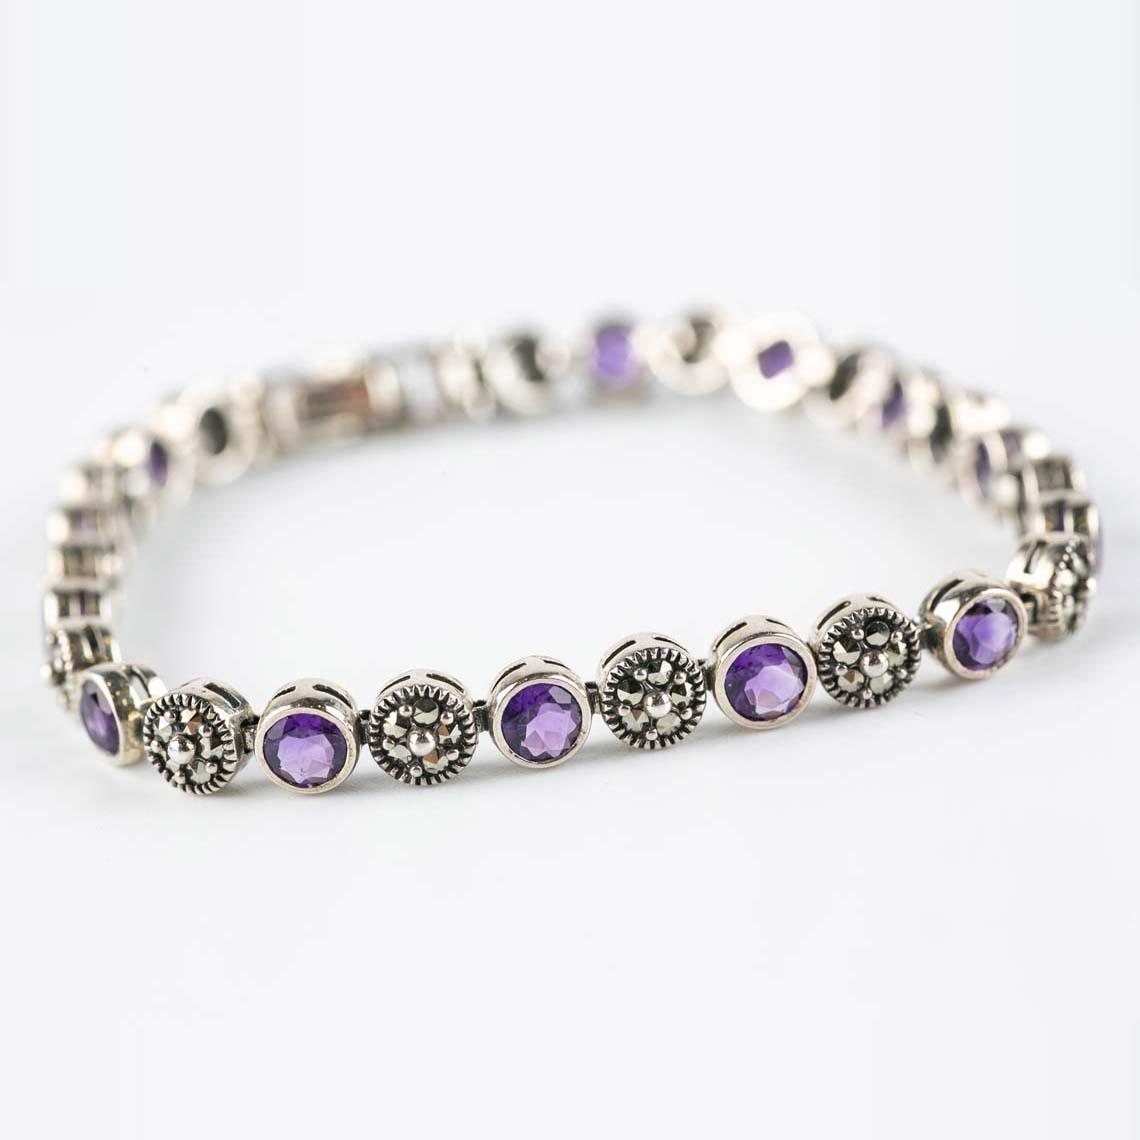 Amethyst and marcasite bracelet